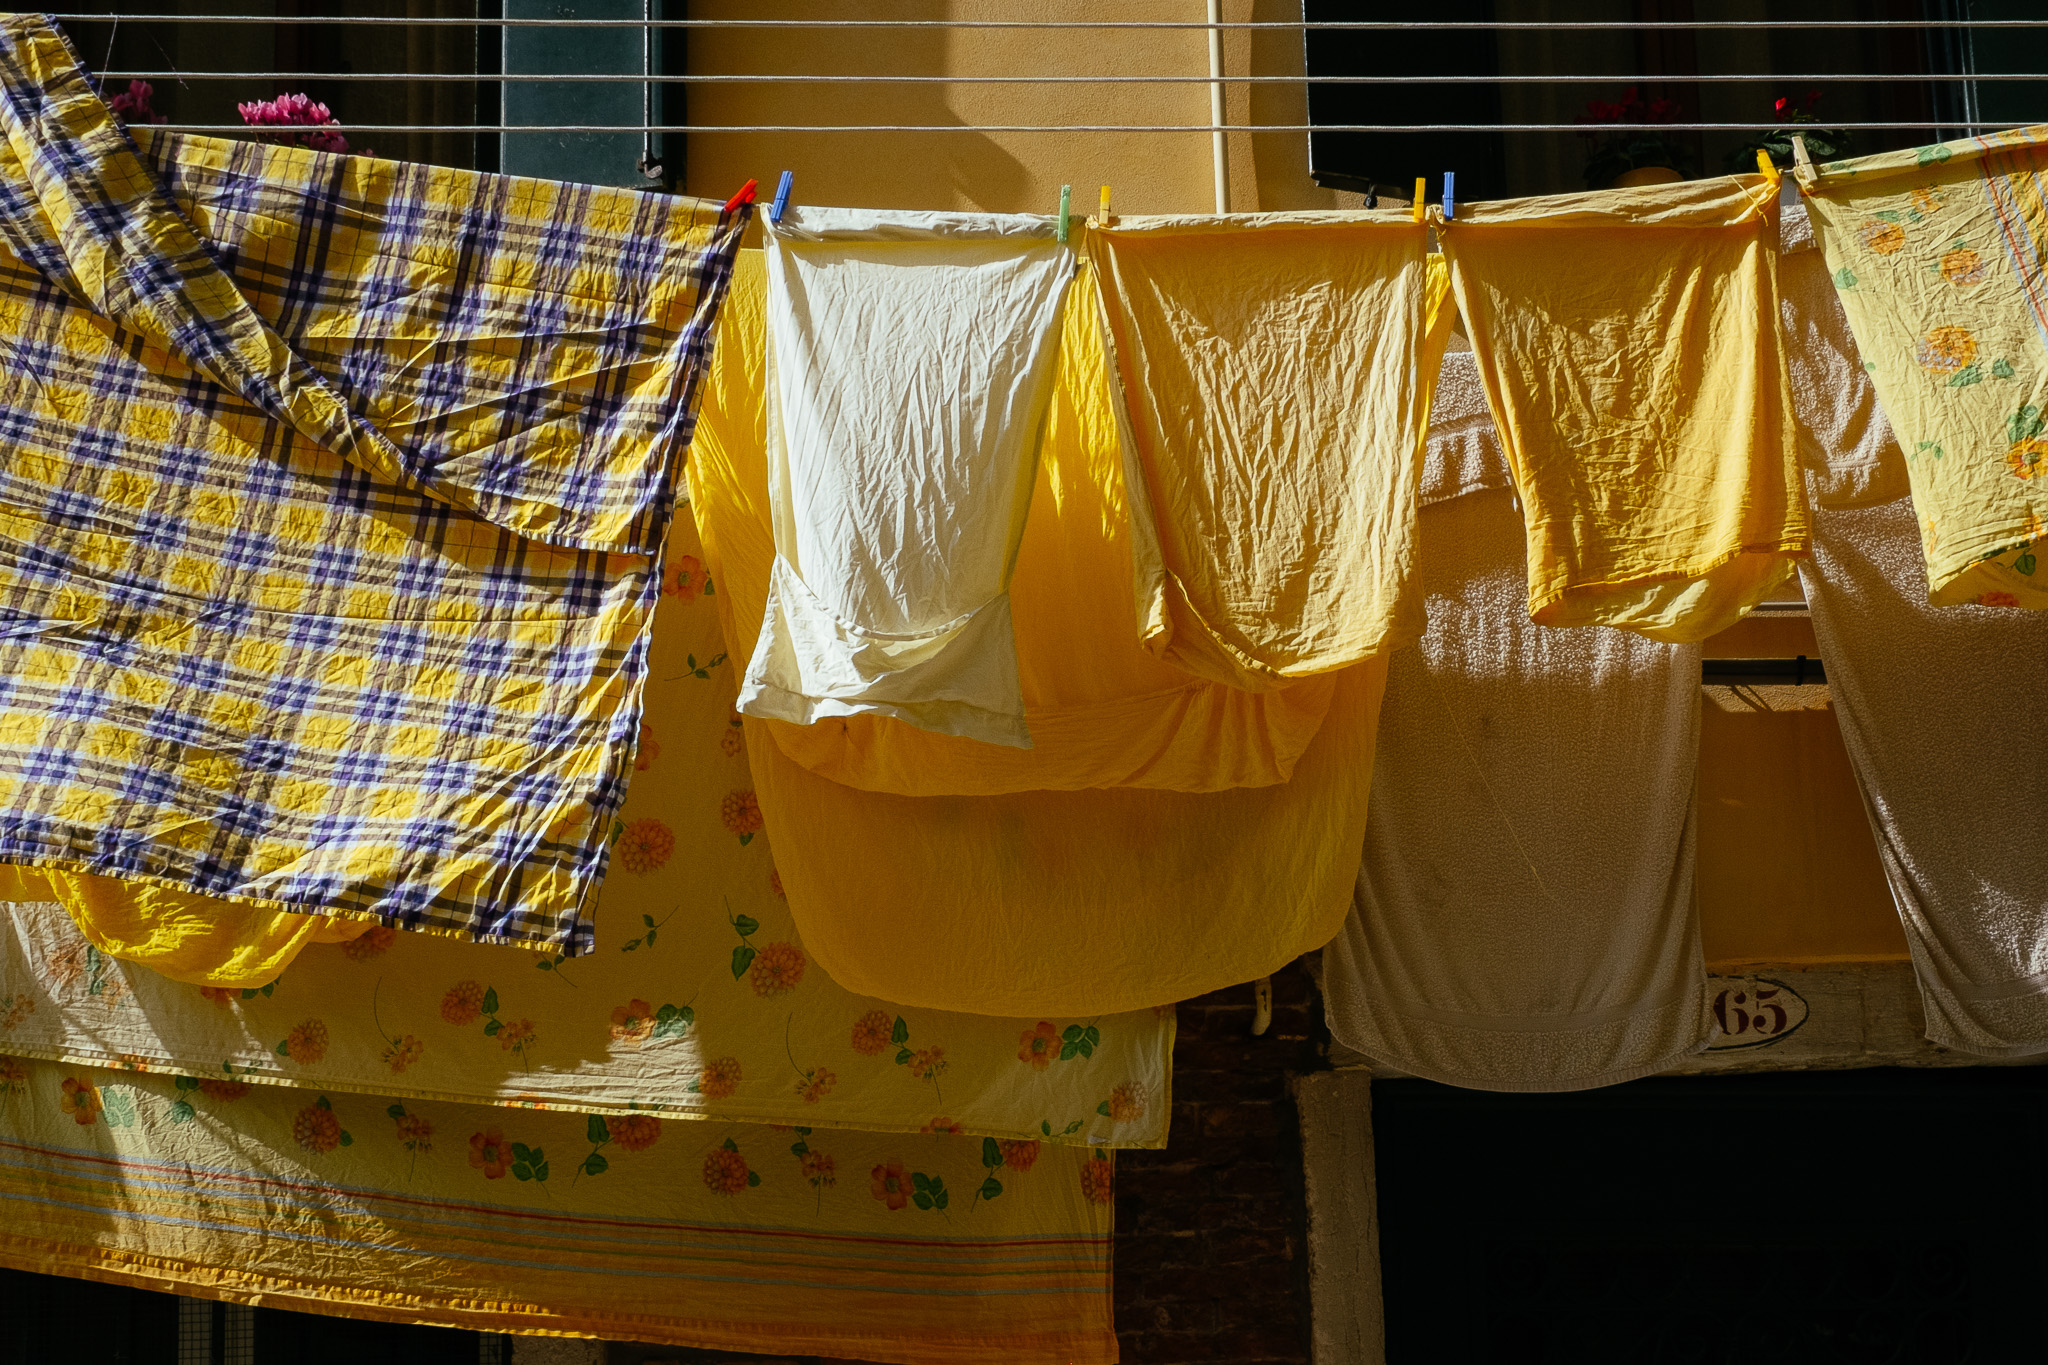 venice-washing-lines-7809